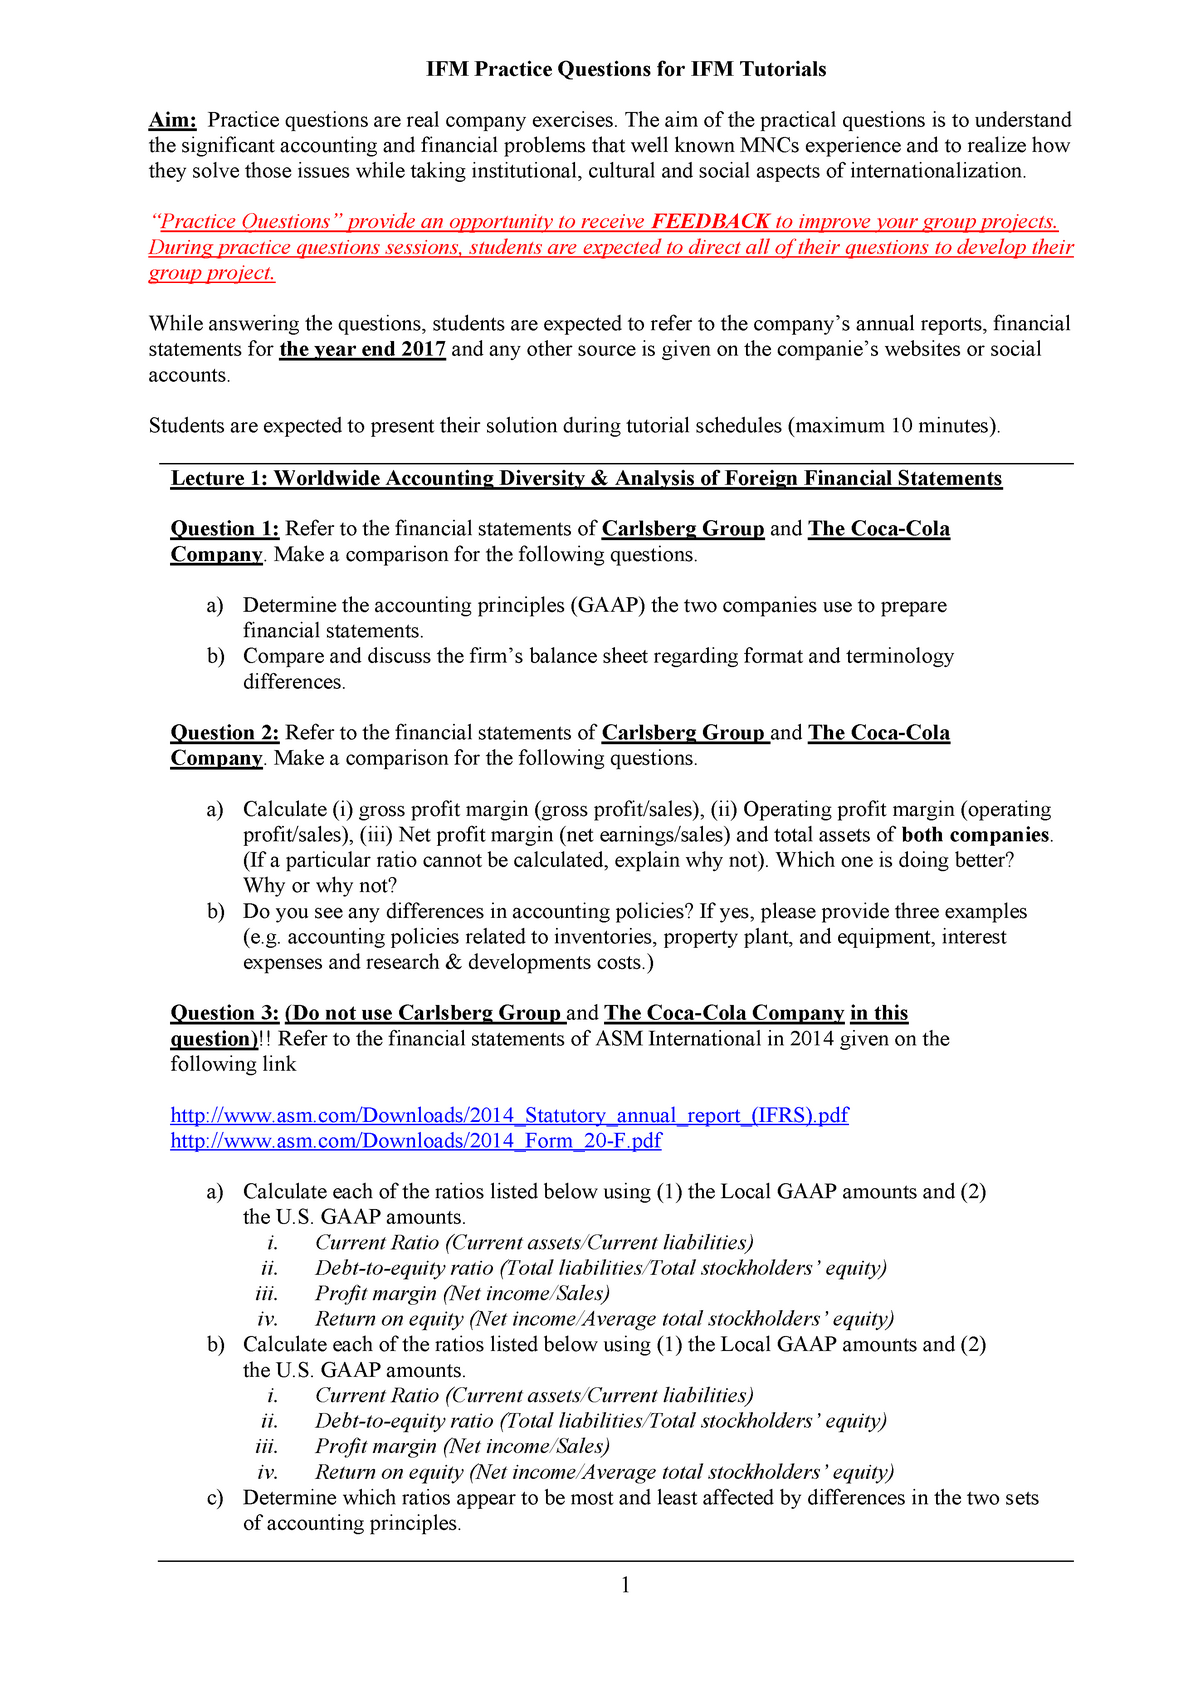 IFM Practice Questions 2018-2019 2b - EBB627A05 - RUG - StuDocu